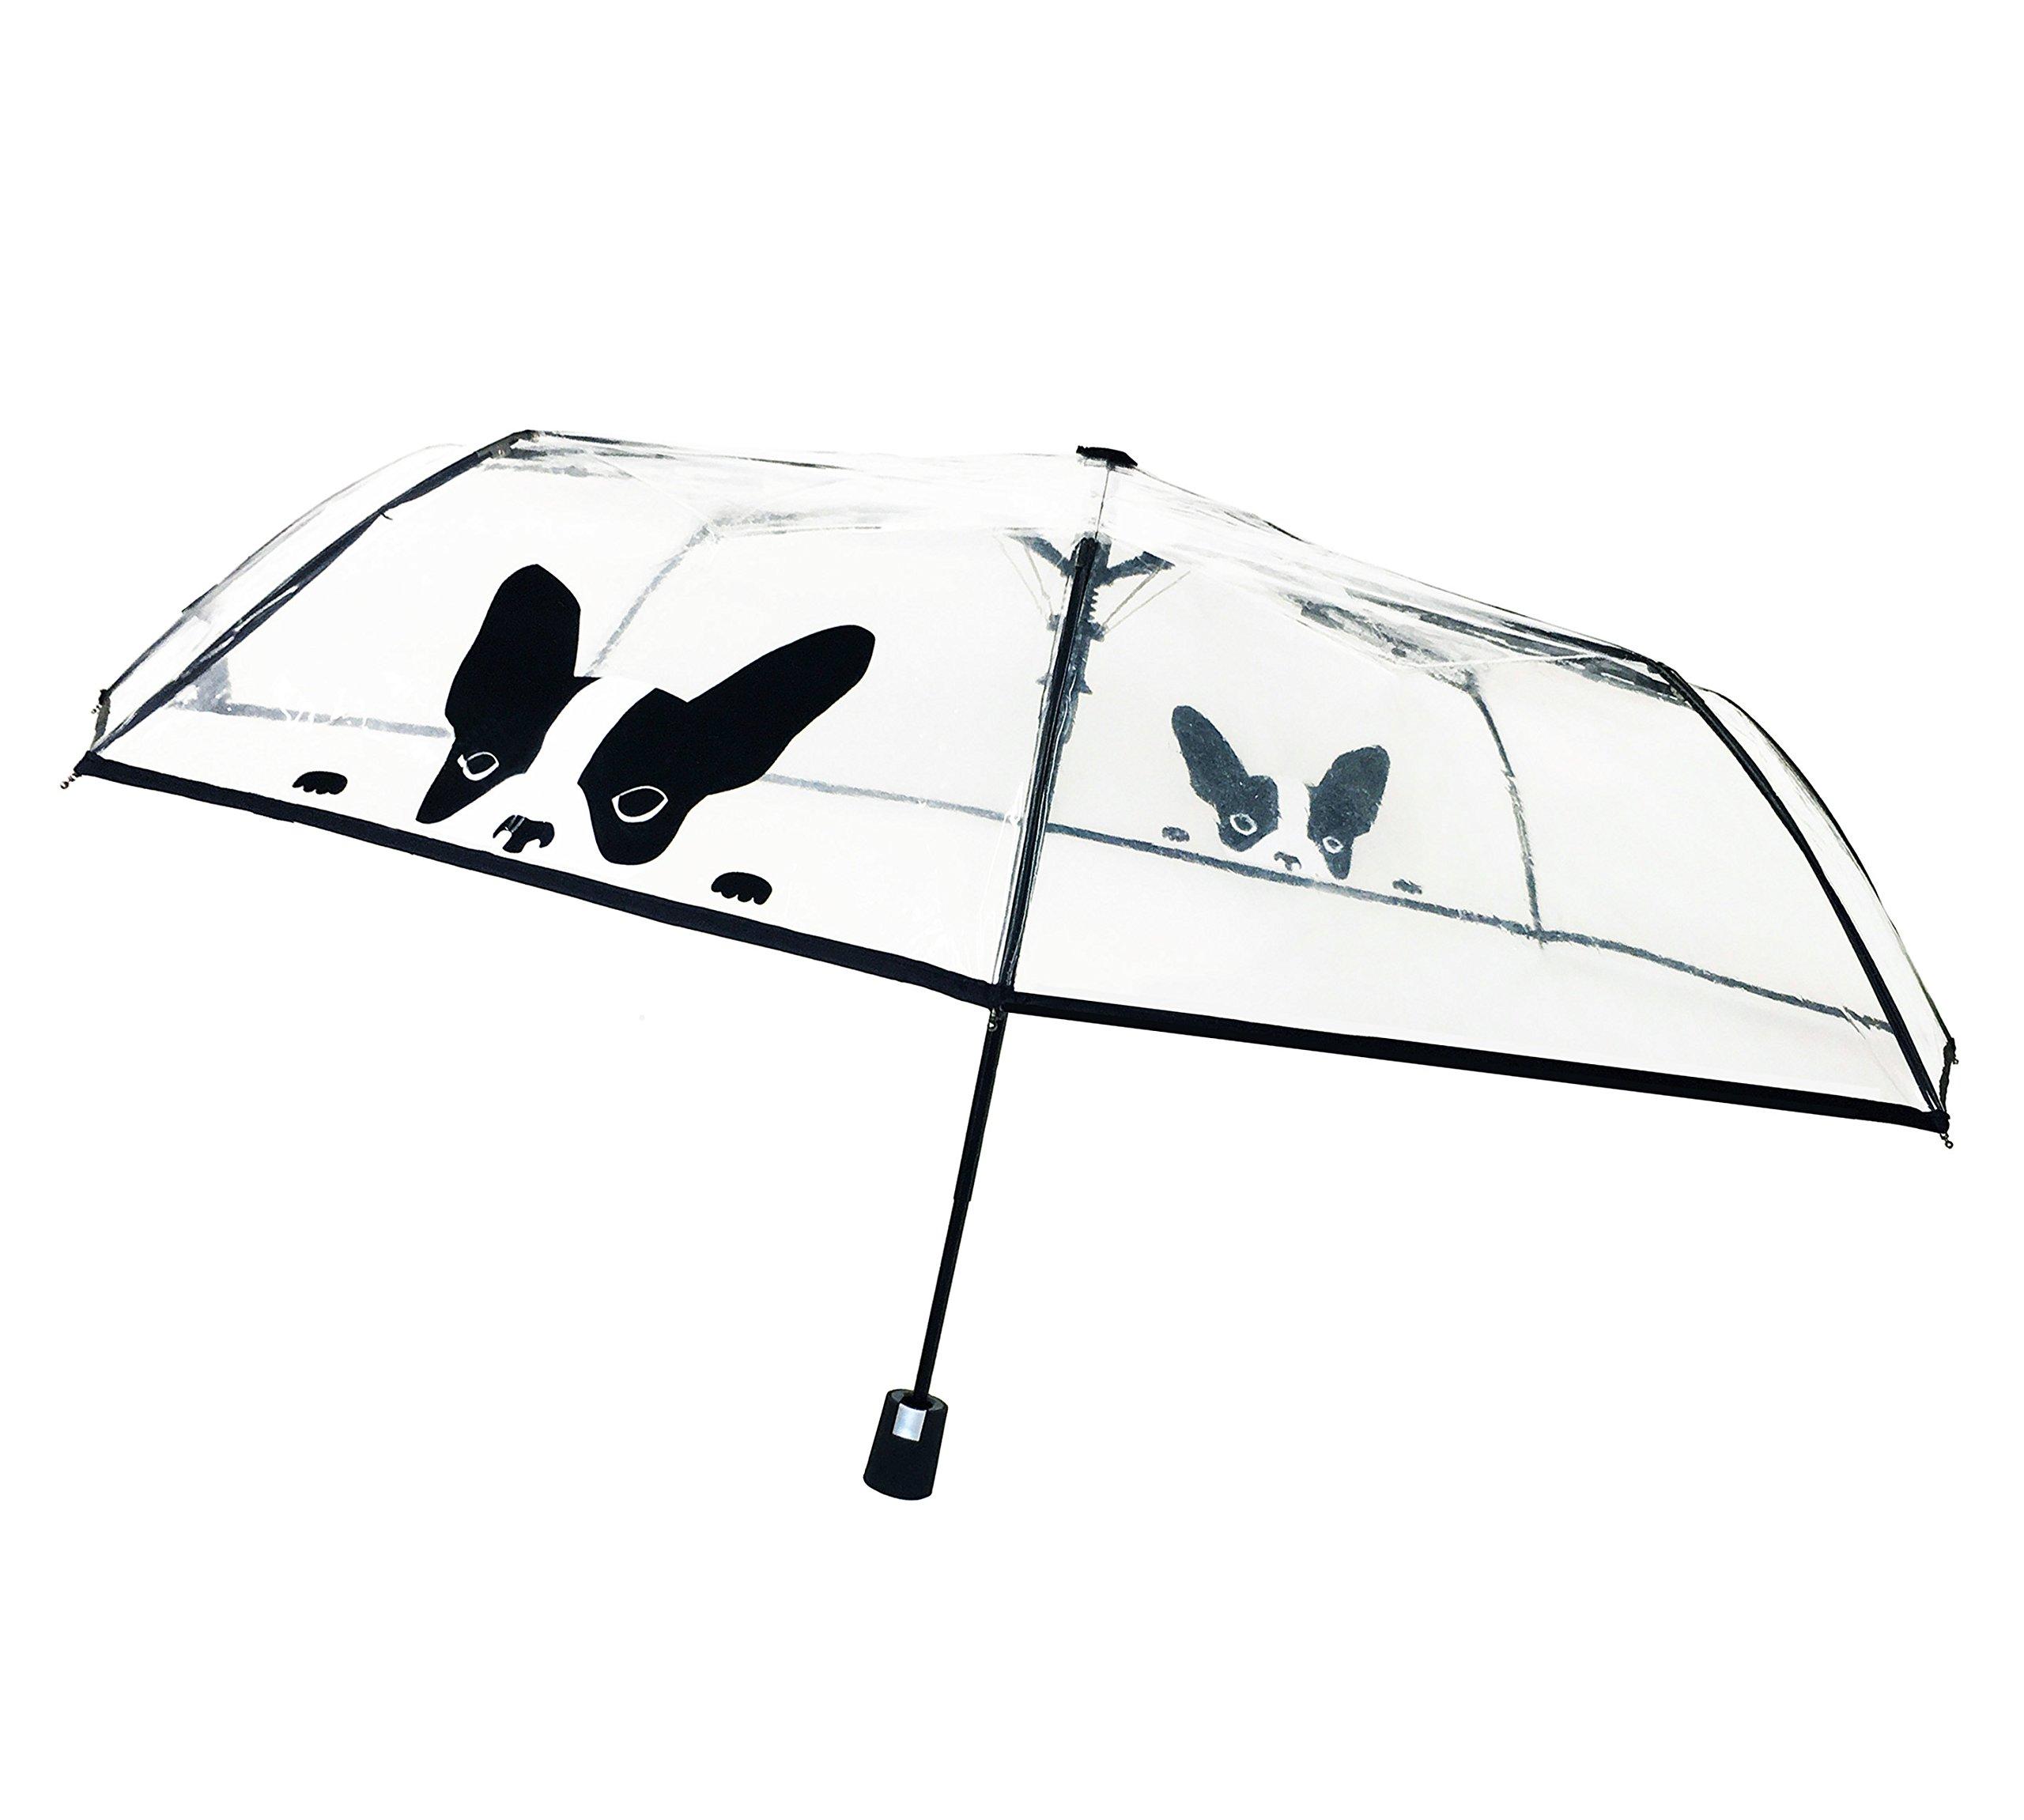 SMATI Clear Folding Umbrella - Compact - Automatic Open - Sturdy - French Bulldogs - French Design